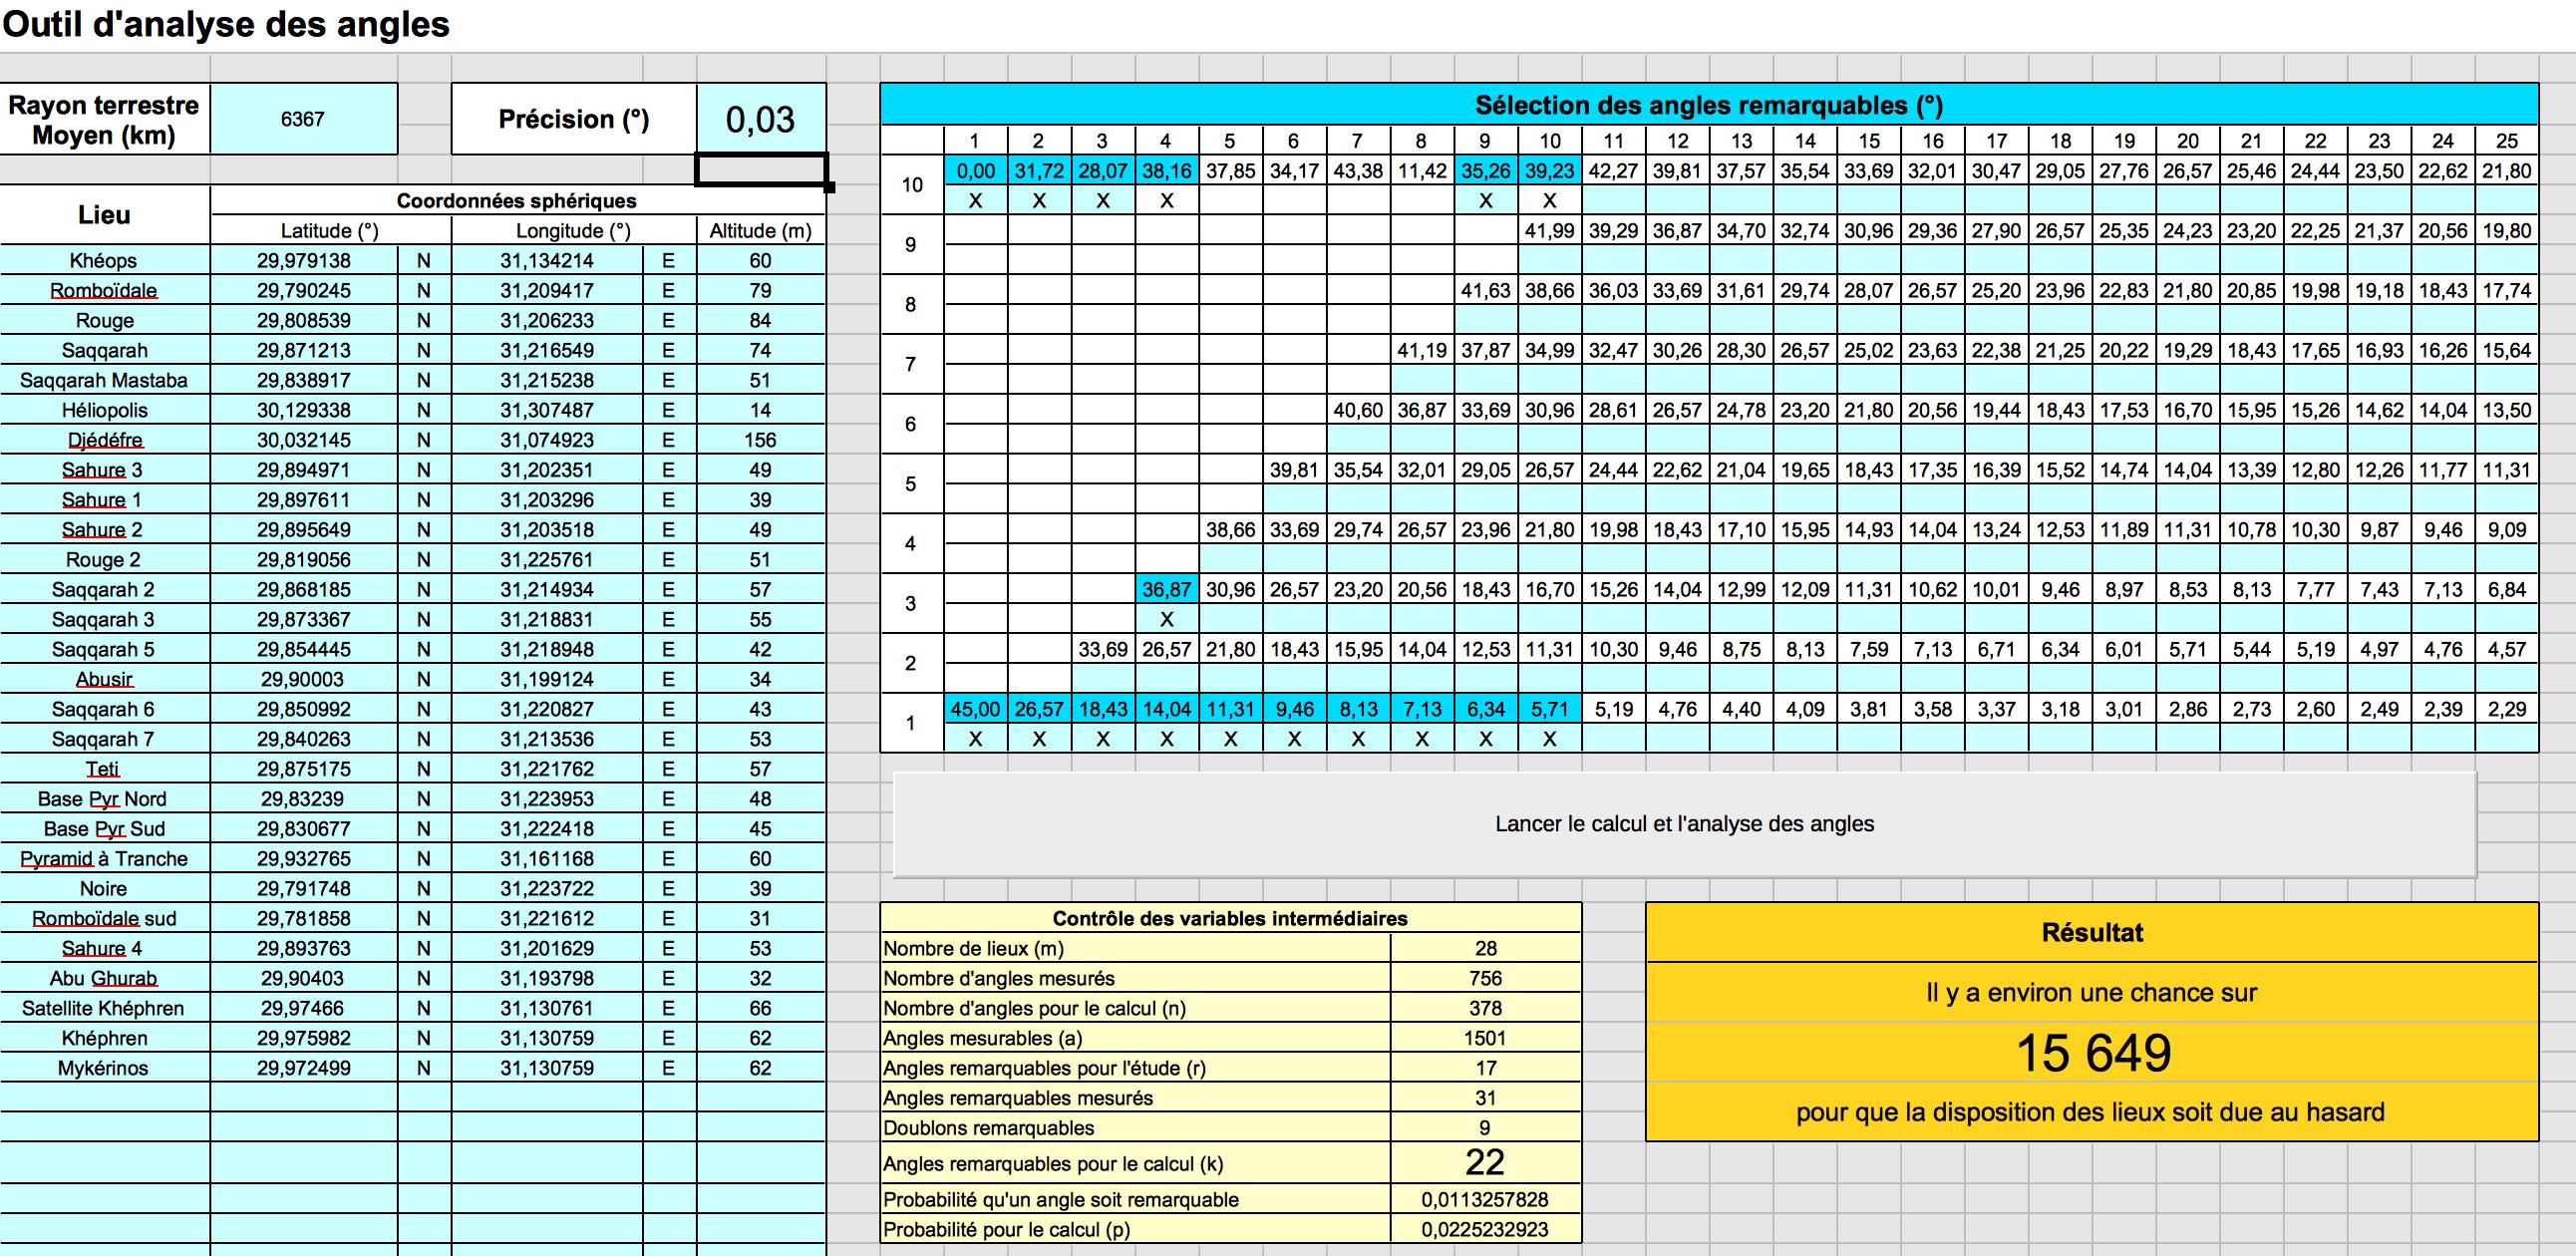 2017-11-16 23:15:52